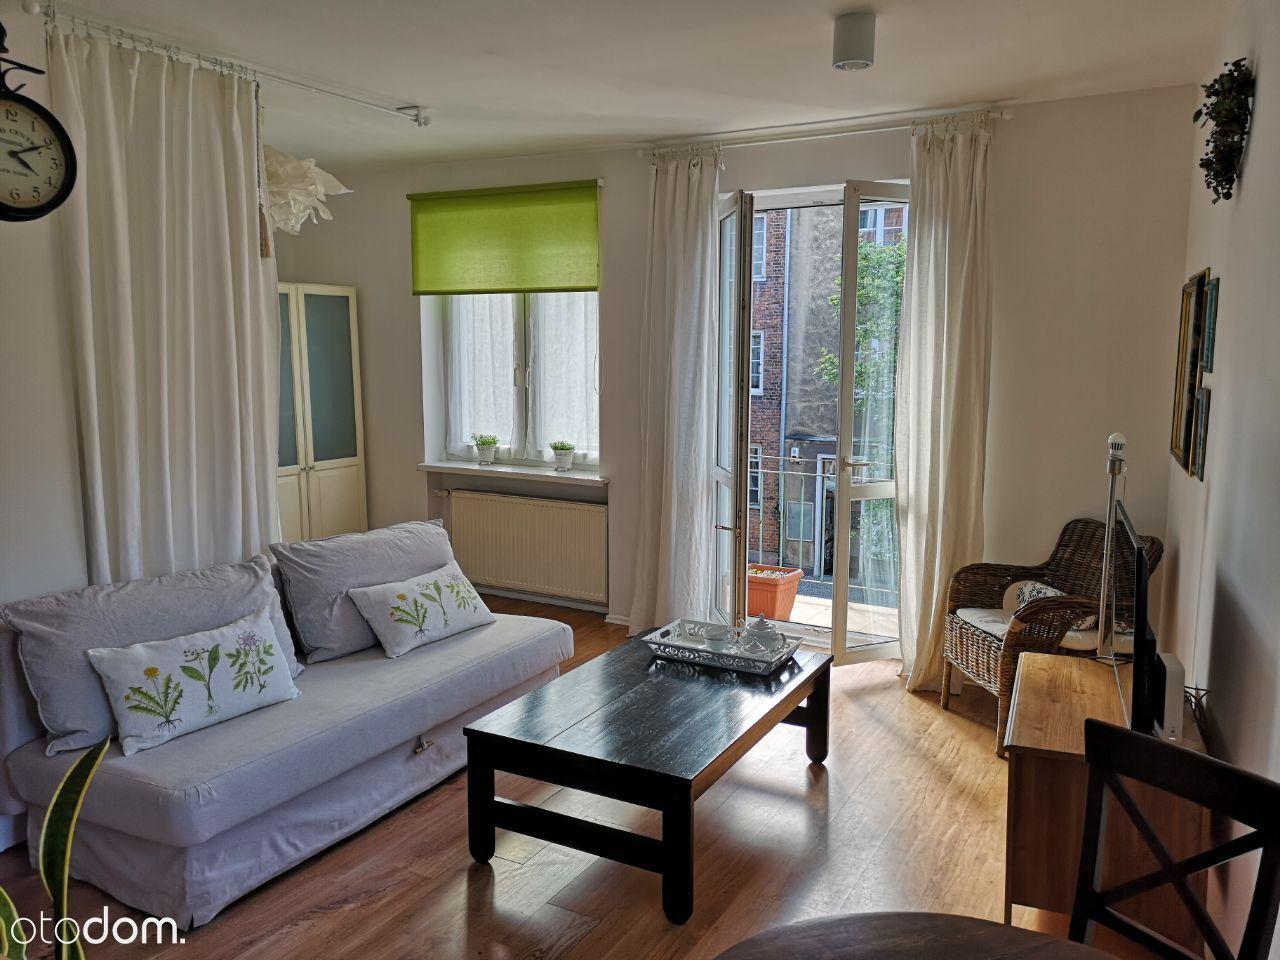 Apartament Studio w samym sercu Starówki